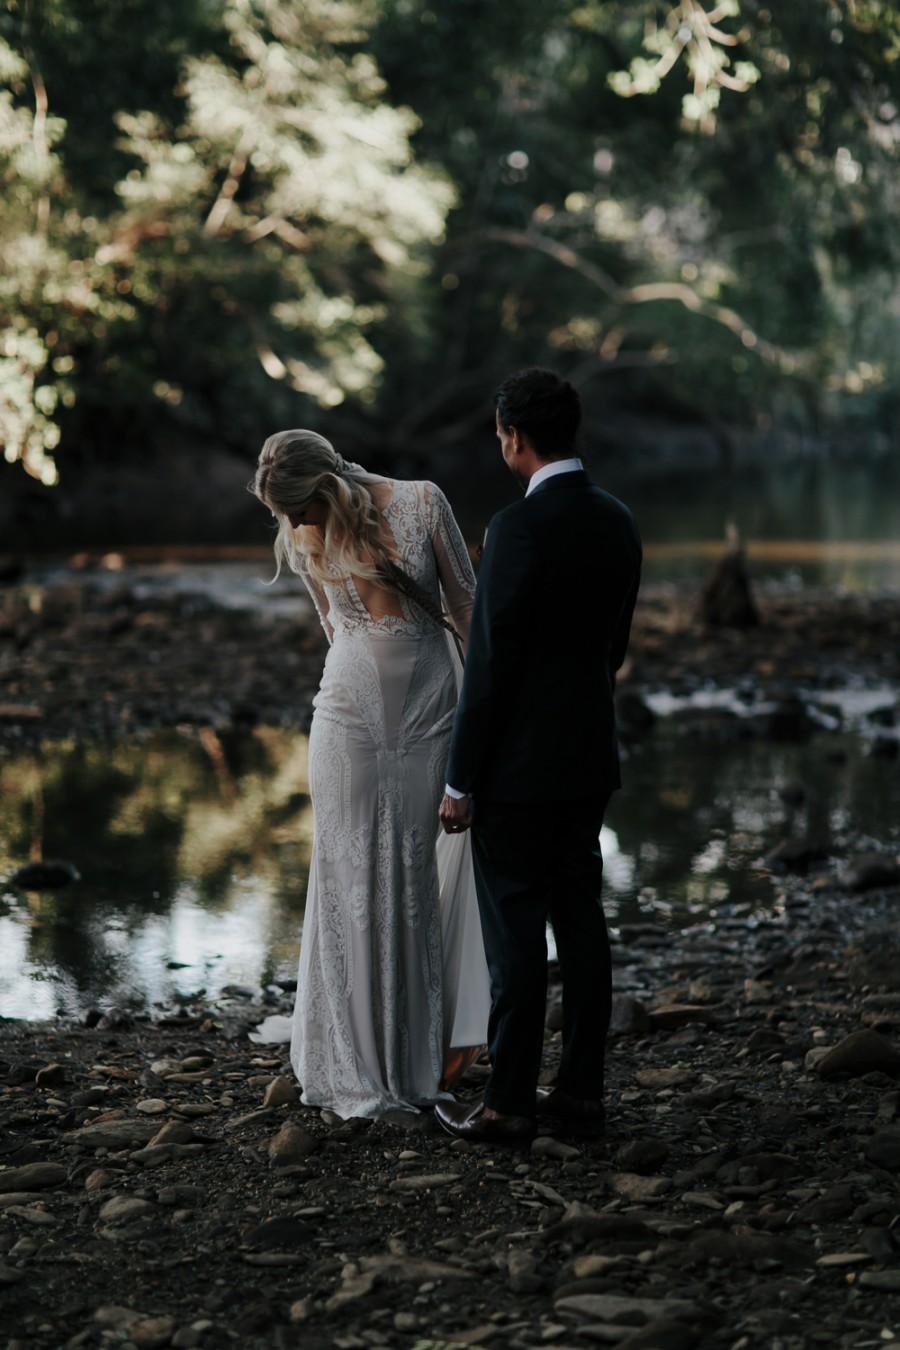 boho-tipi-wedding-sheraton-port-douglas-oli-sansom-29-900x0-c-default.jpg